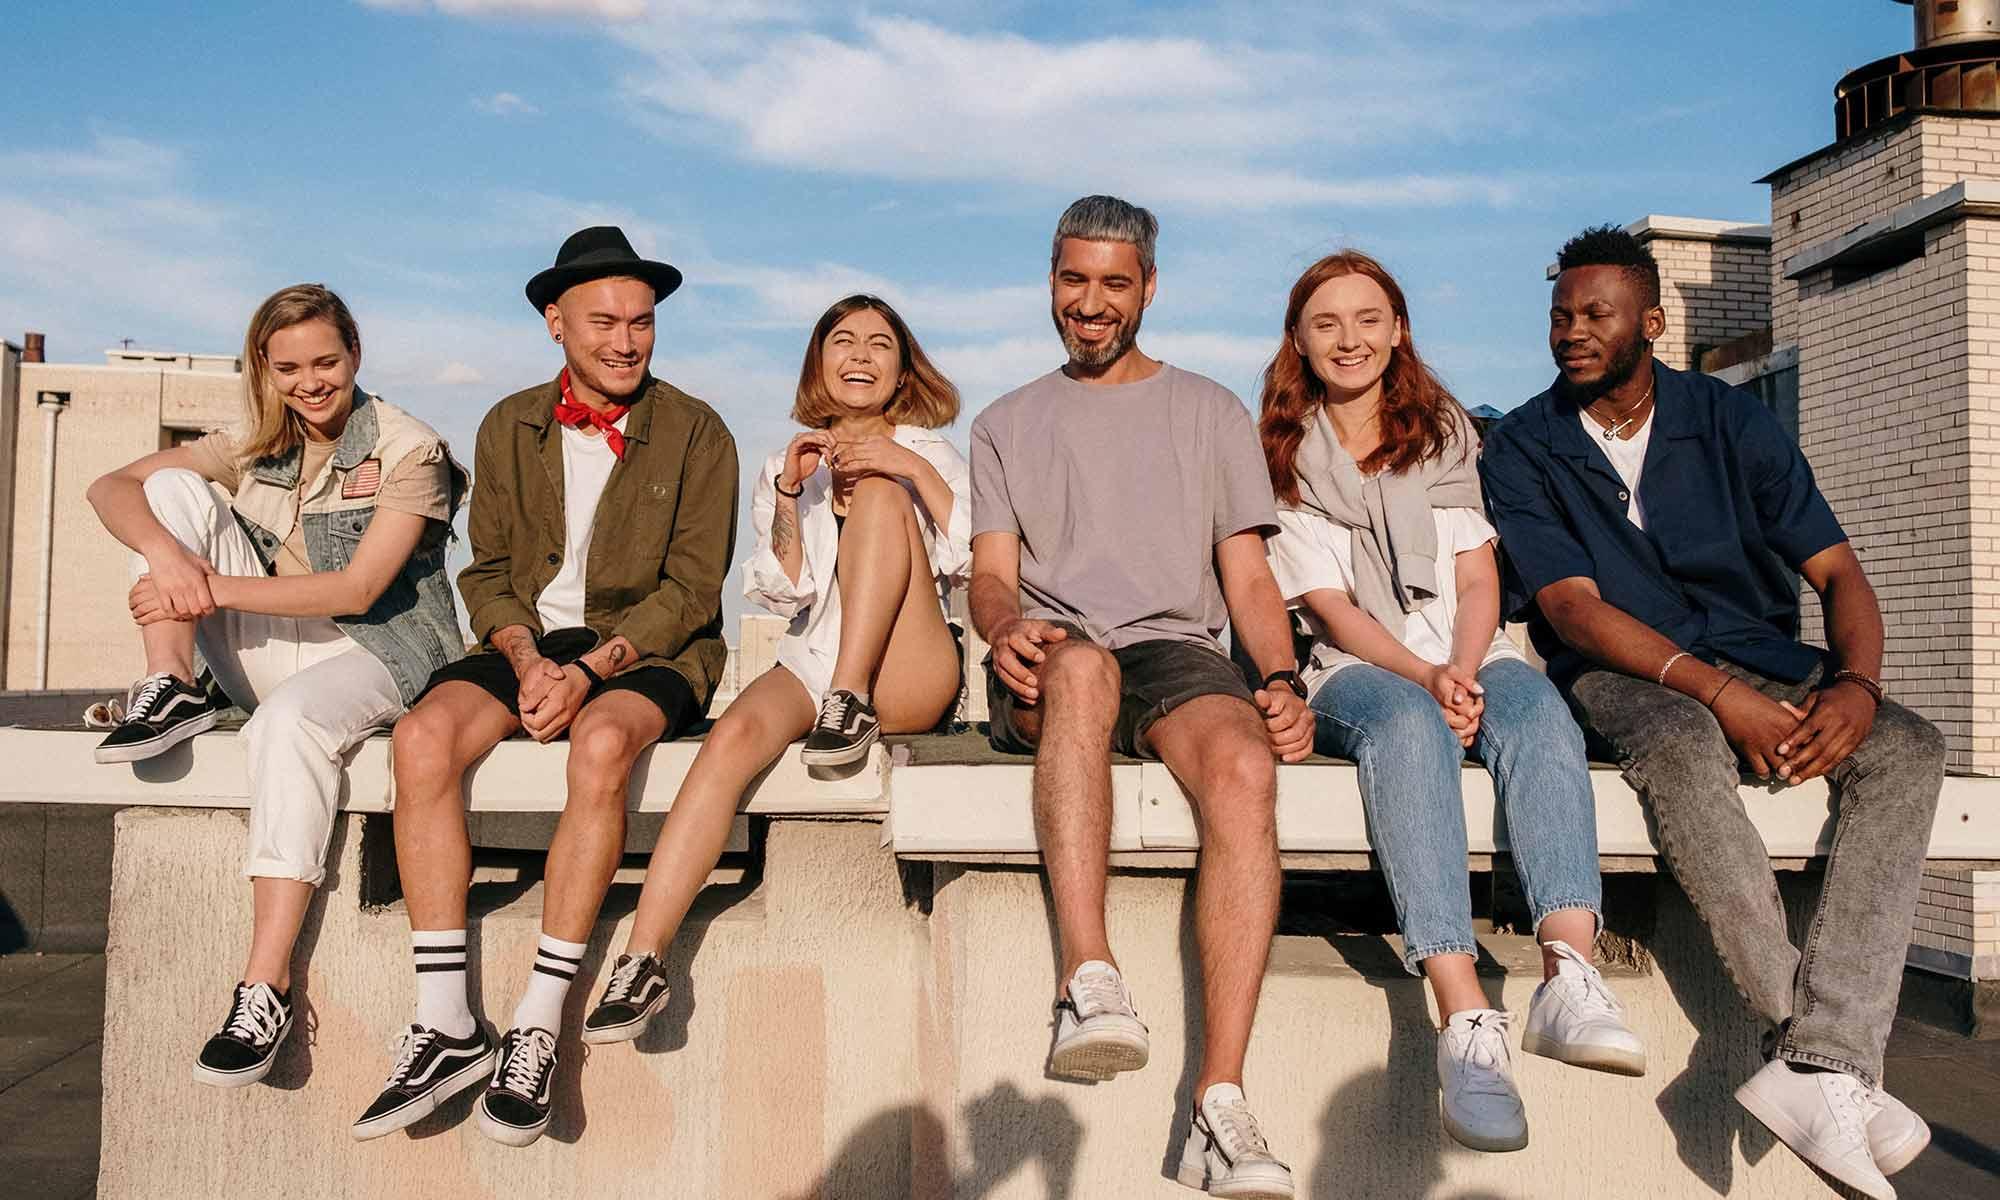 Diverse group sitting together